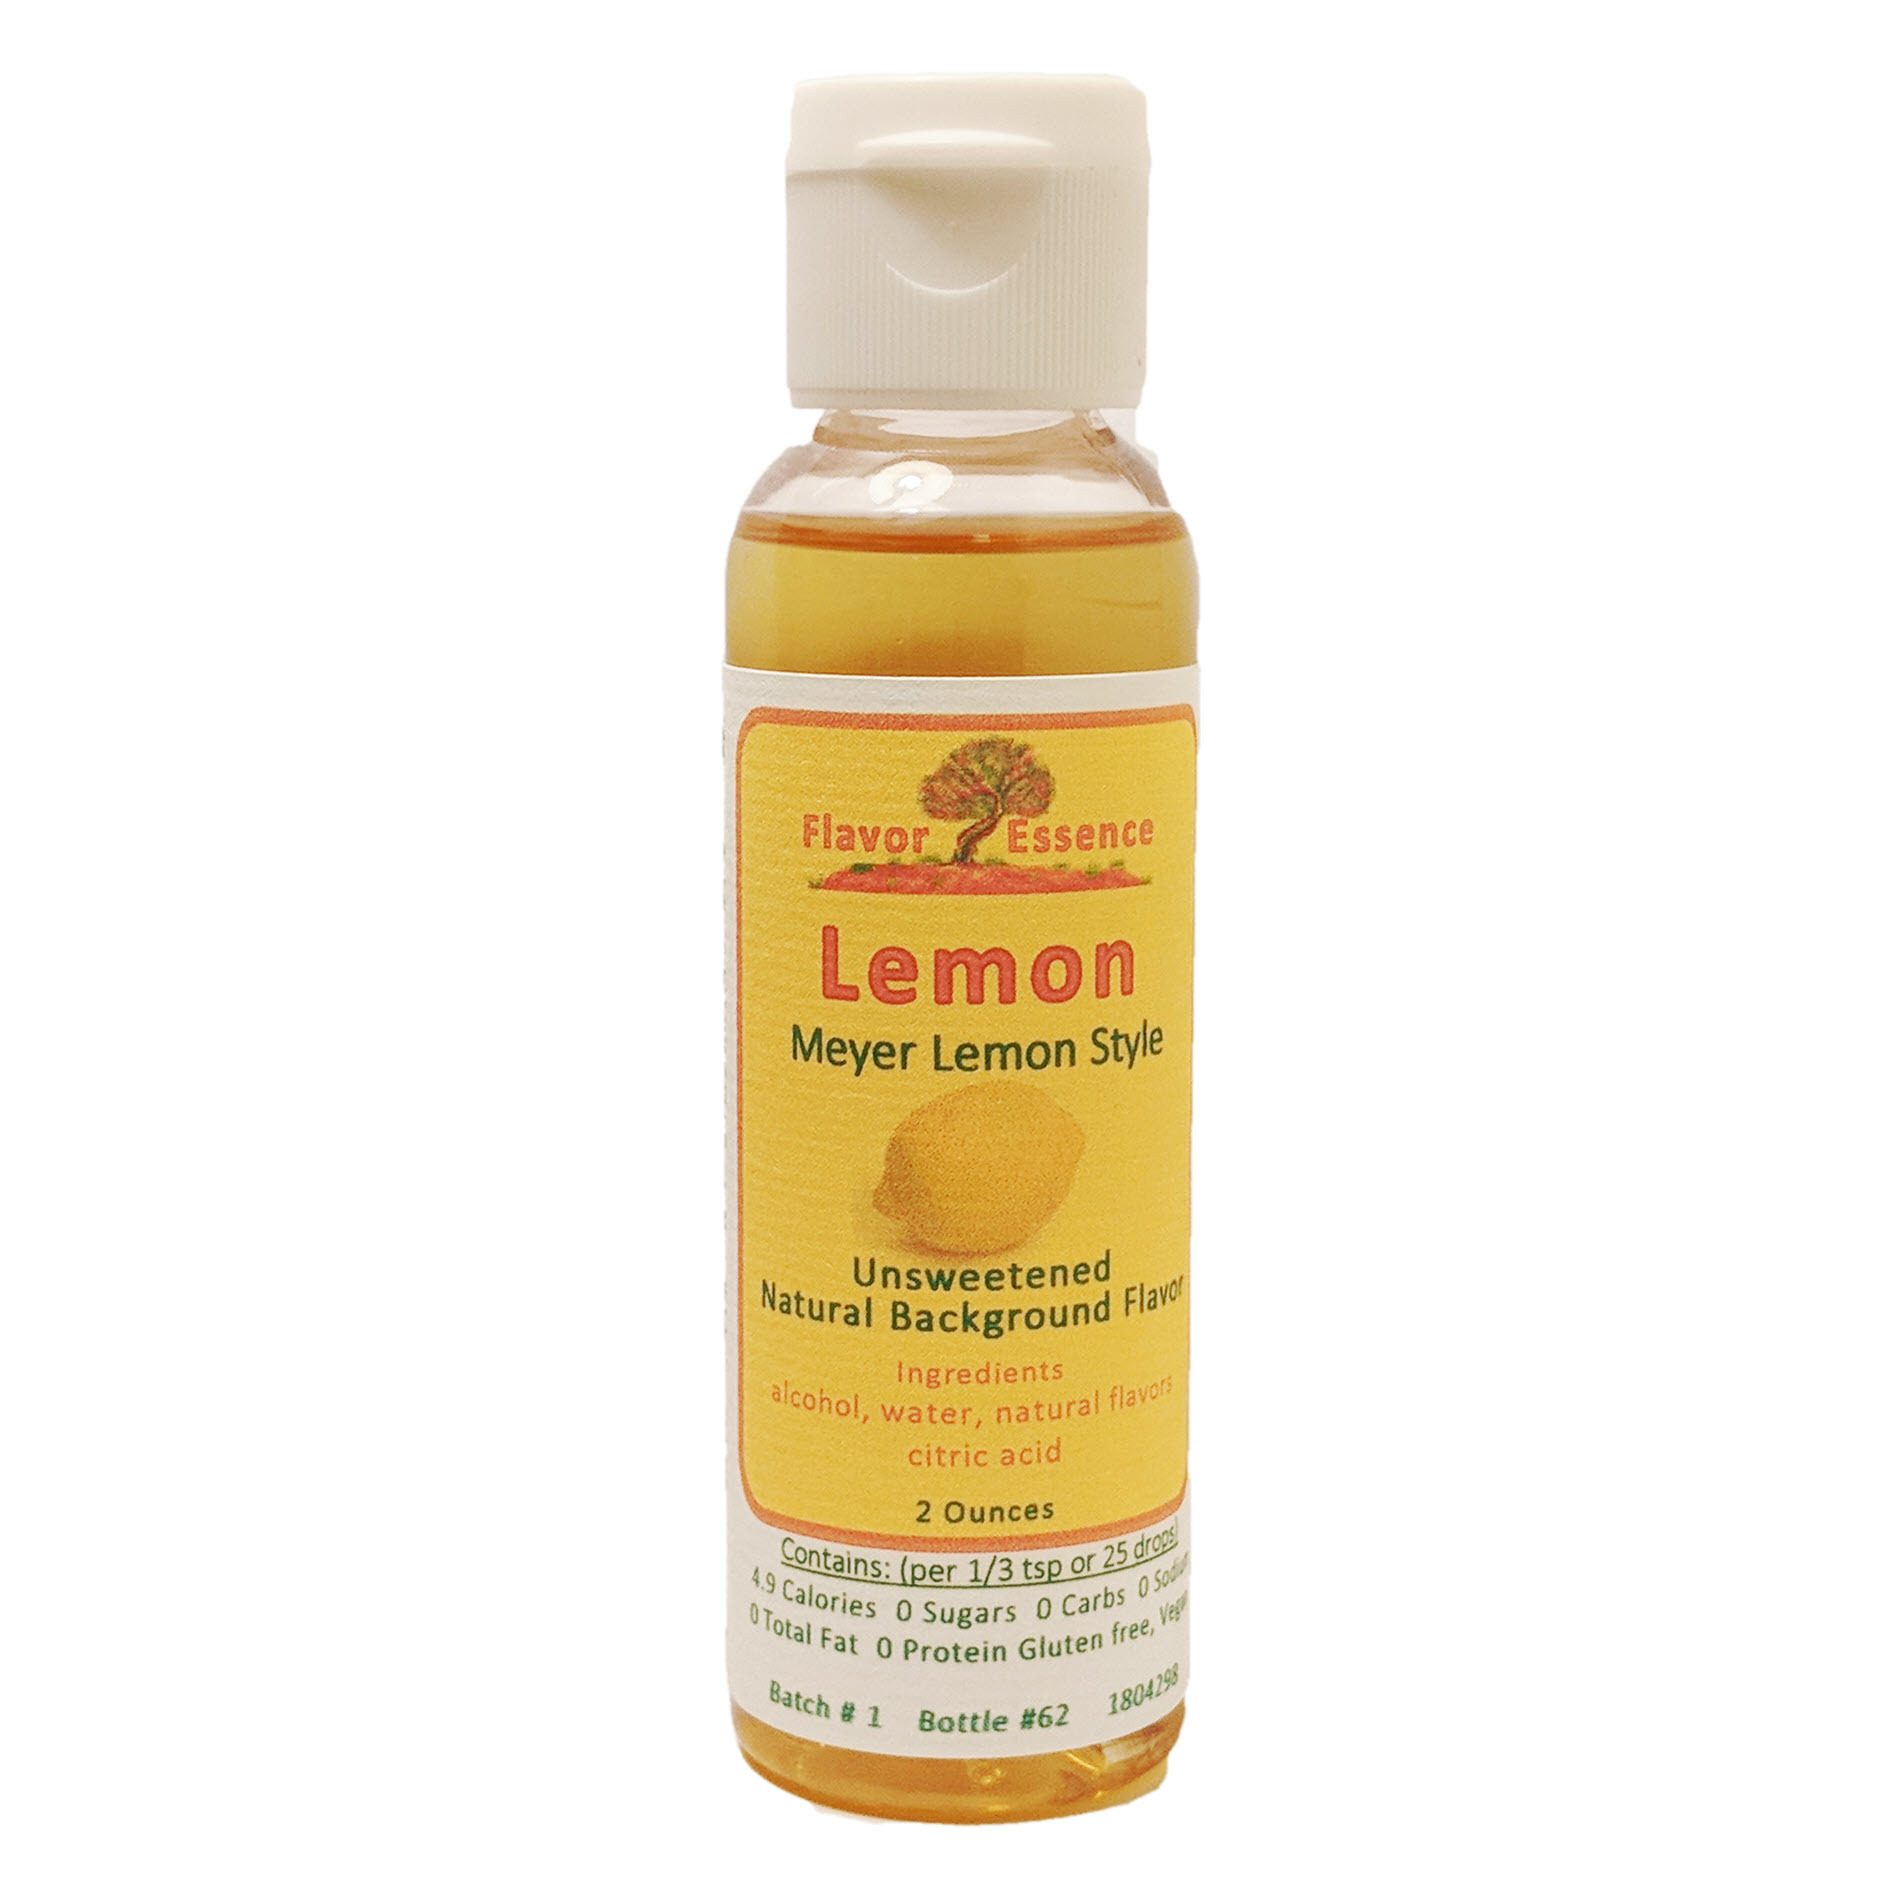 Flavor Essence LEMON (Meyer Lemon) -Unsweetened Natural Flavoring Lem